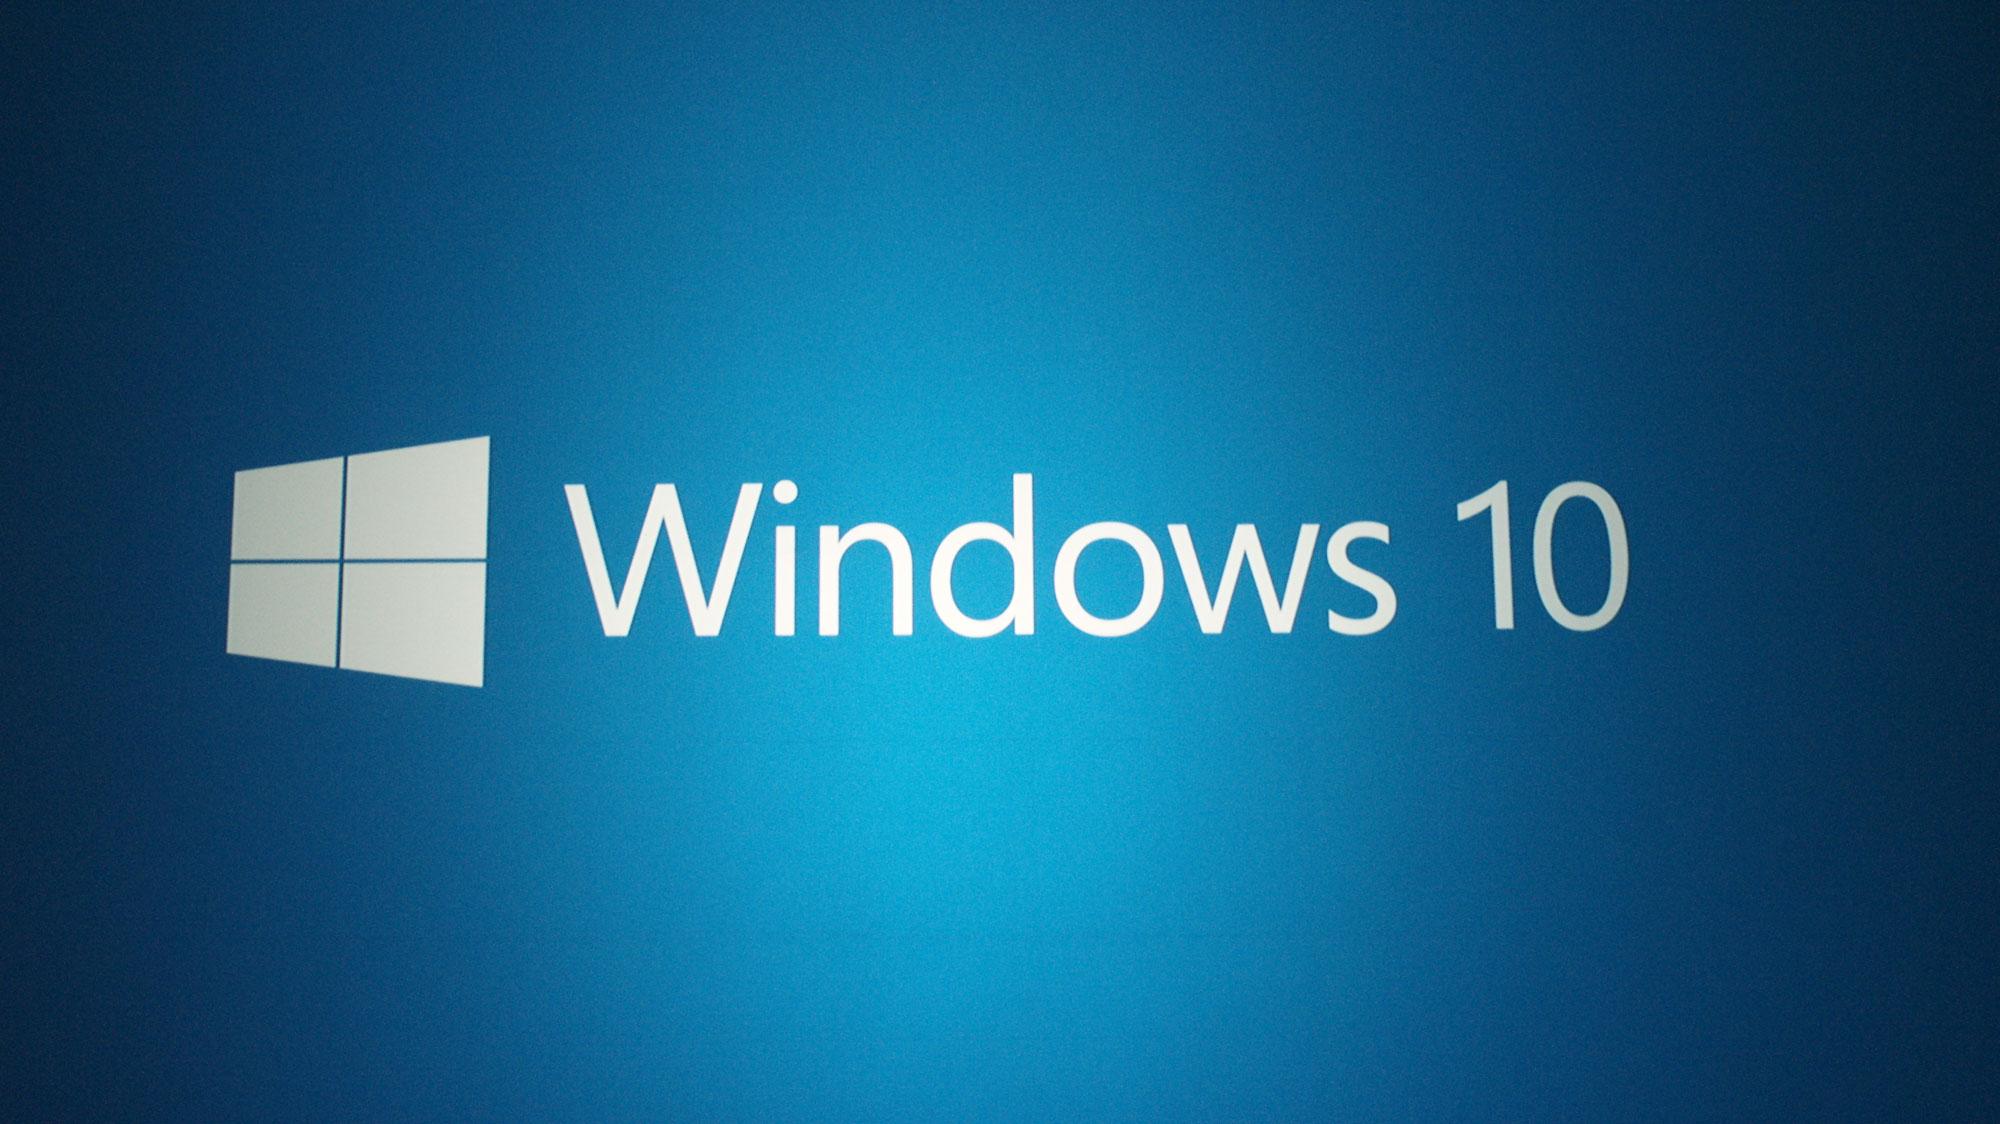 windows10_logo.jpg